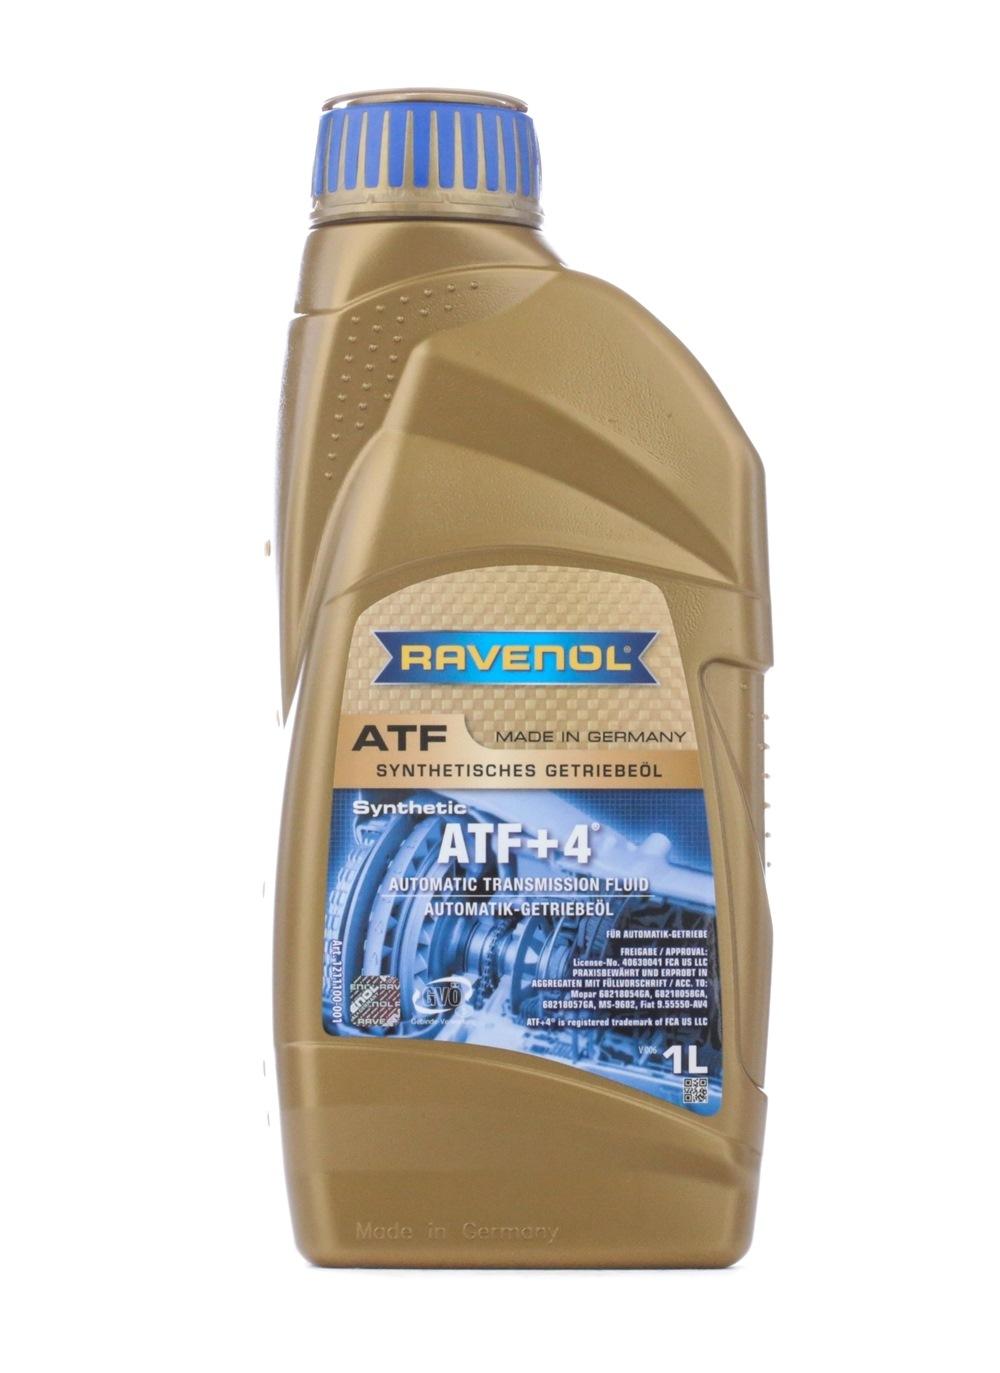 1211100-001-01-999 RAVENOL ATF+4 Inhalt: 1l, API ATF+4 Automatikgetriebeöl 1211100-001-01-999 günstig kaufen